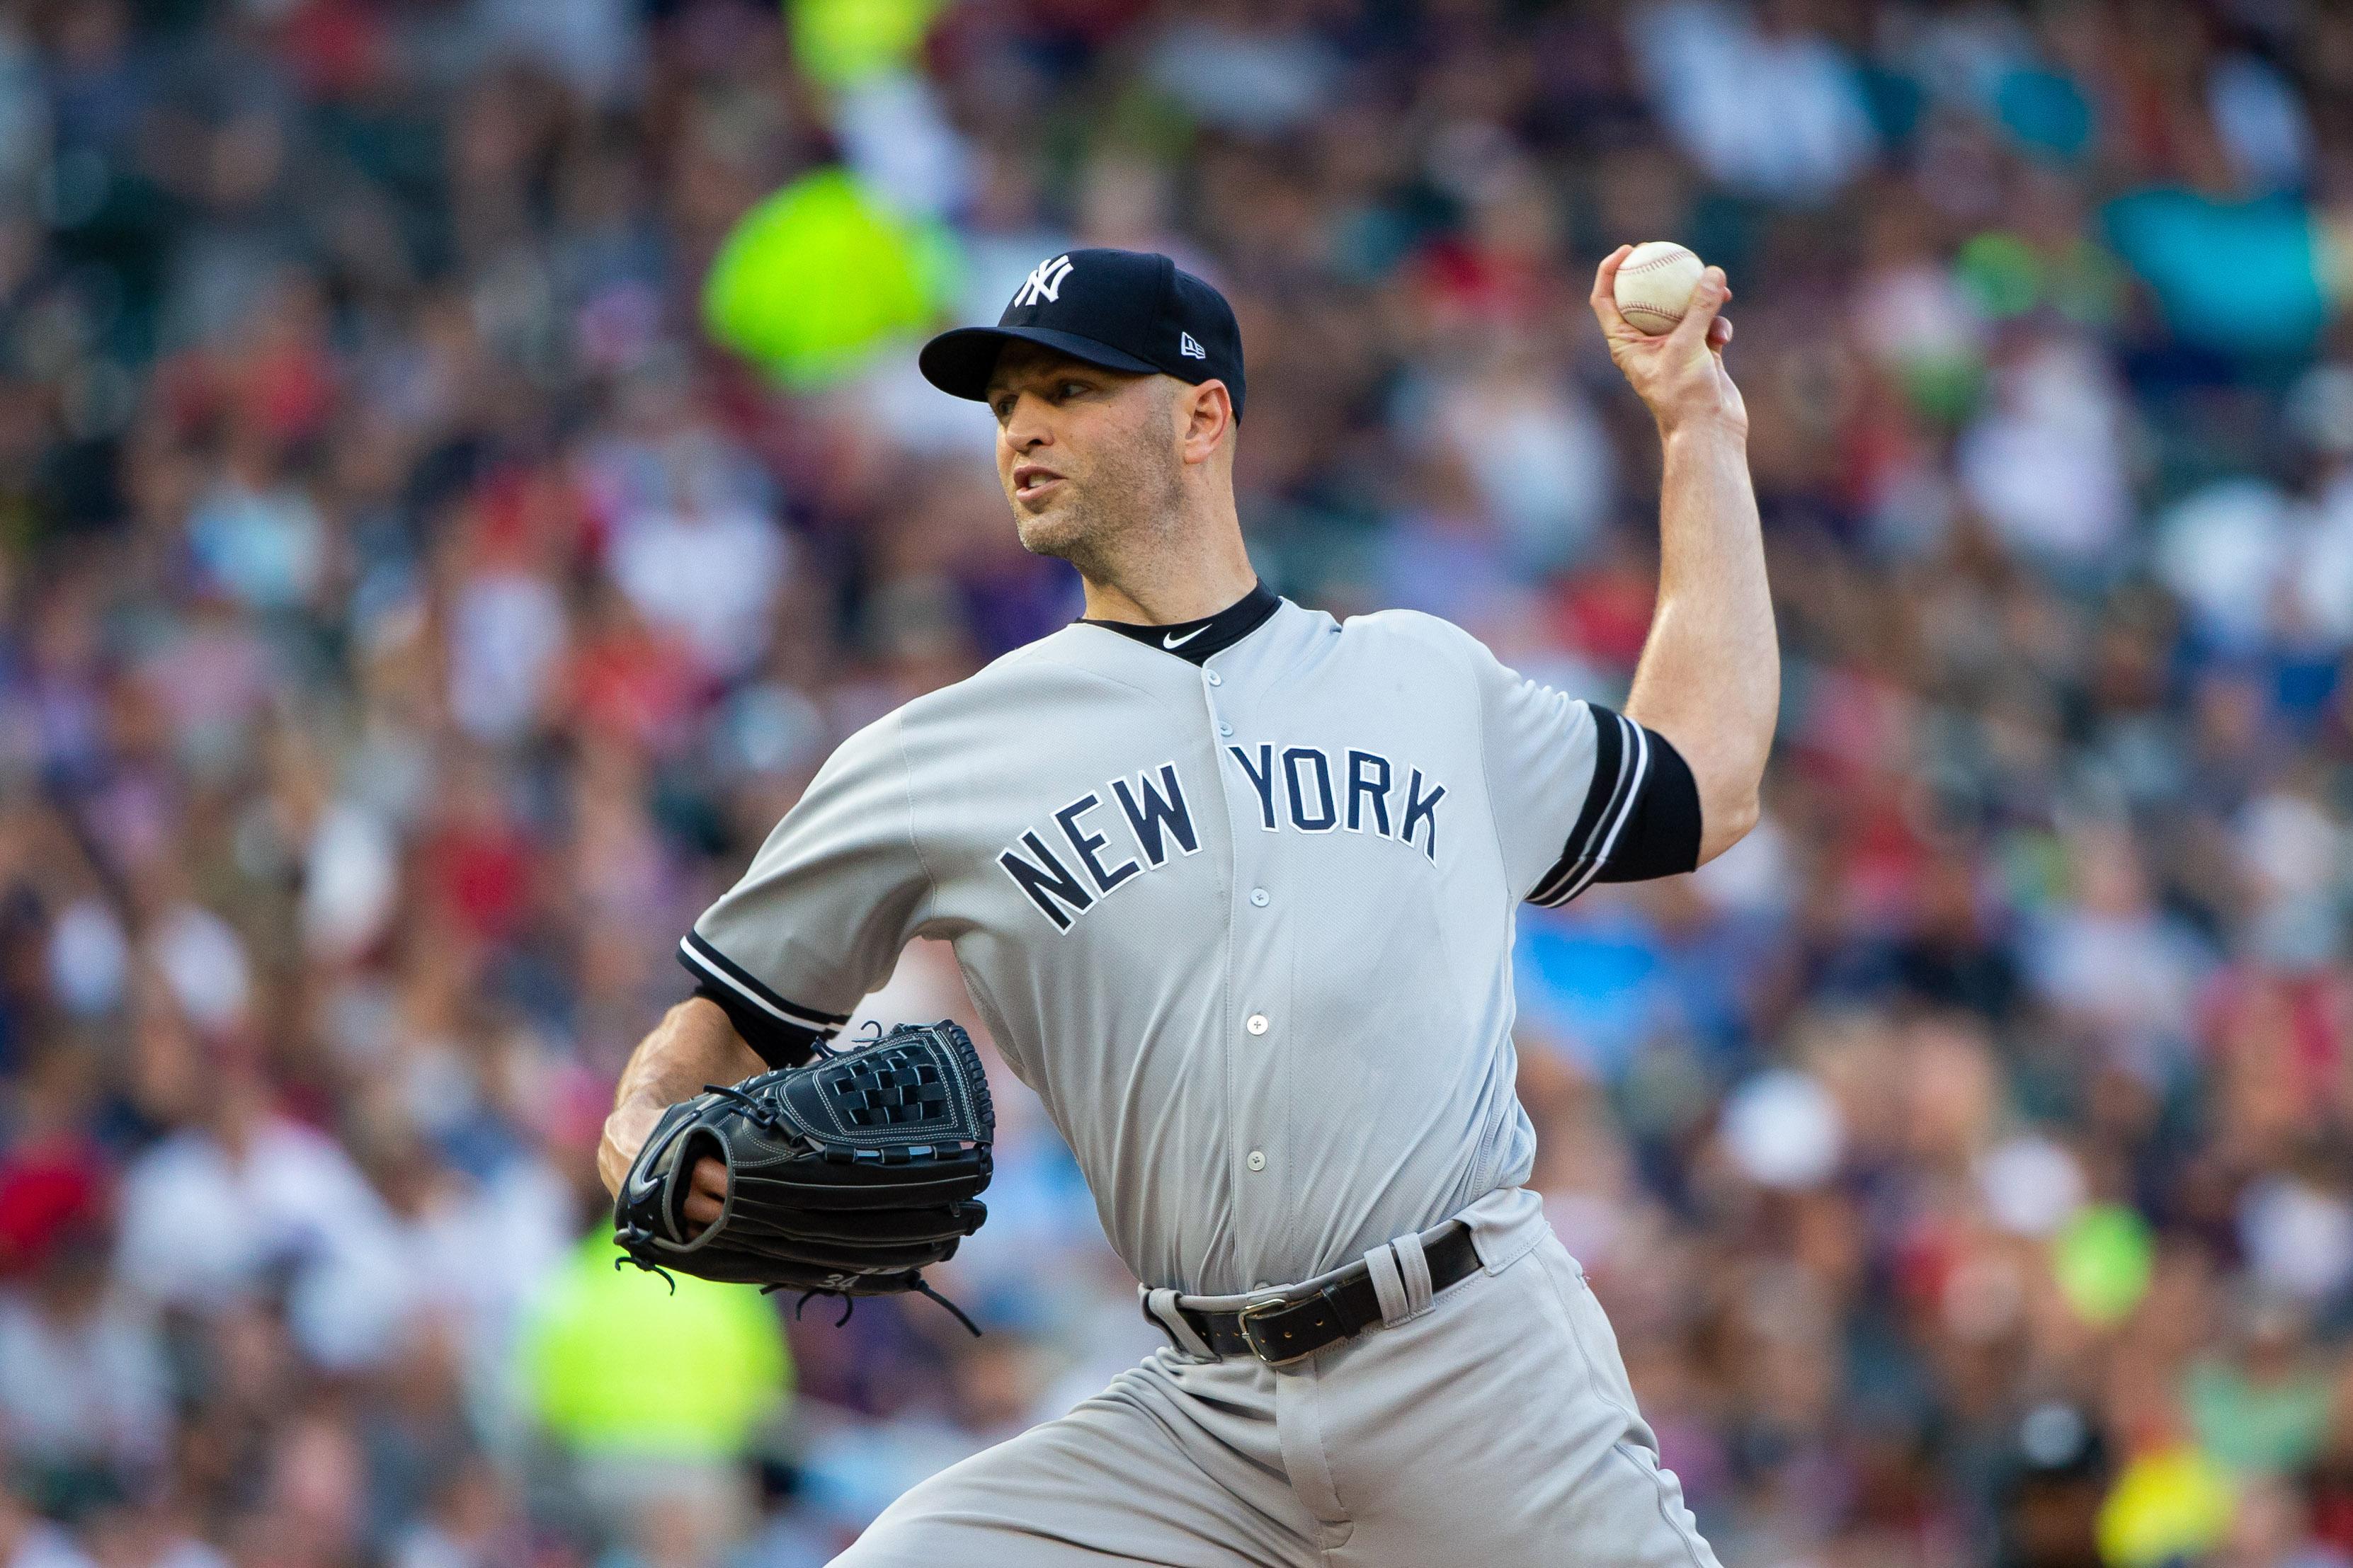 Brian Cashman Endorses J.A. Happ as Yankees' No. 5 Starter